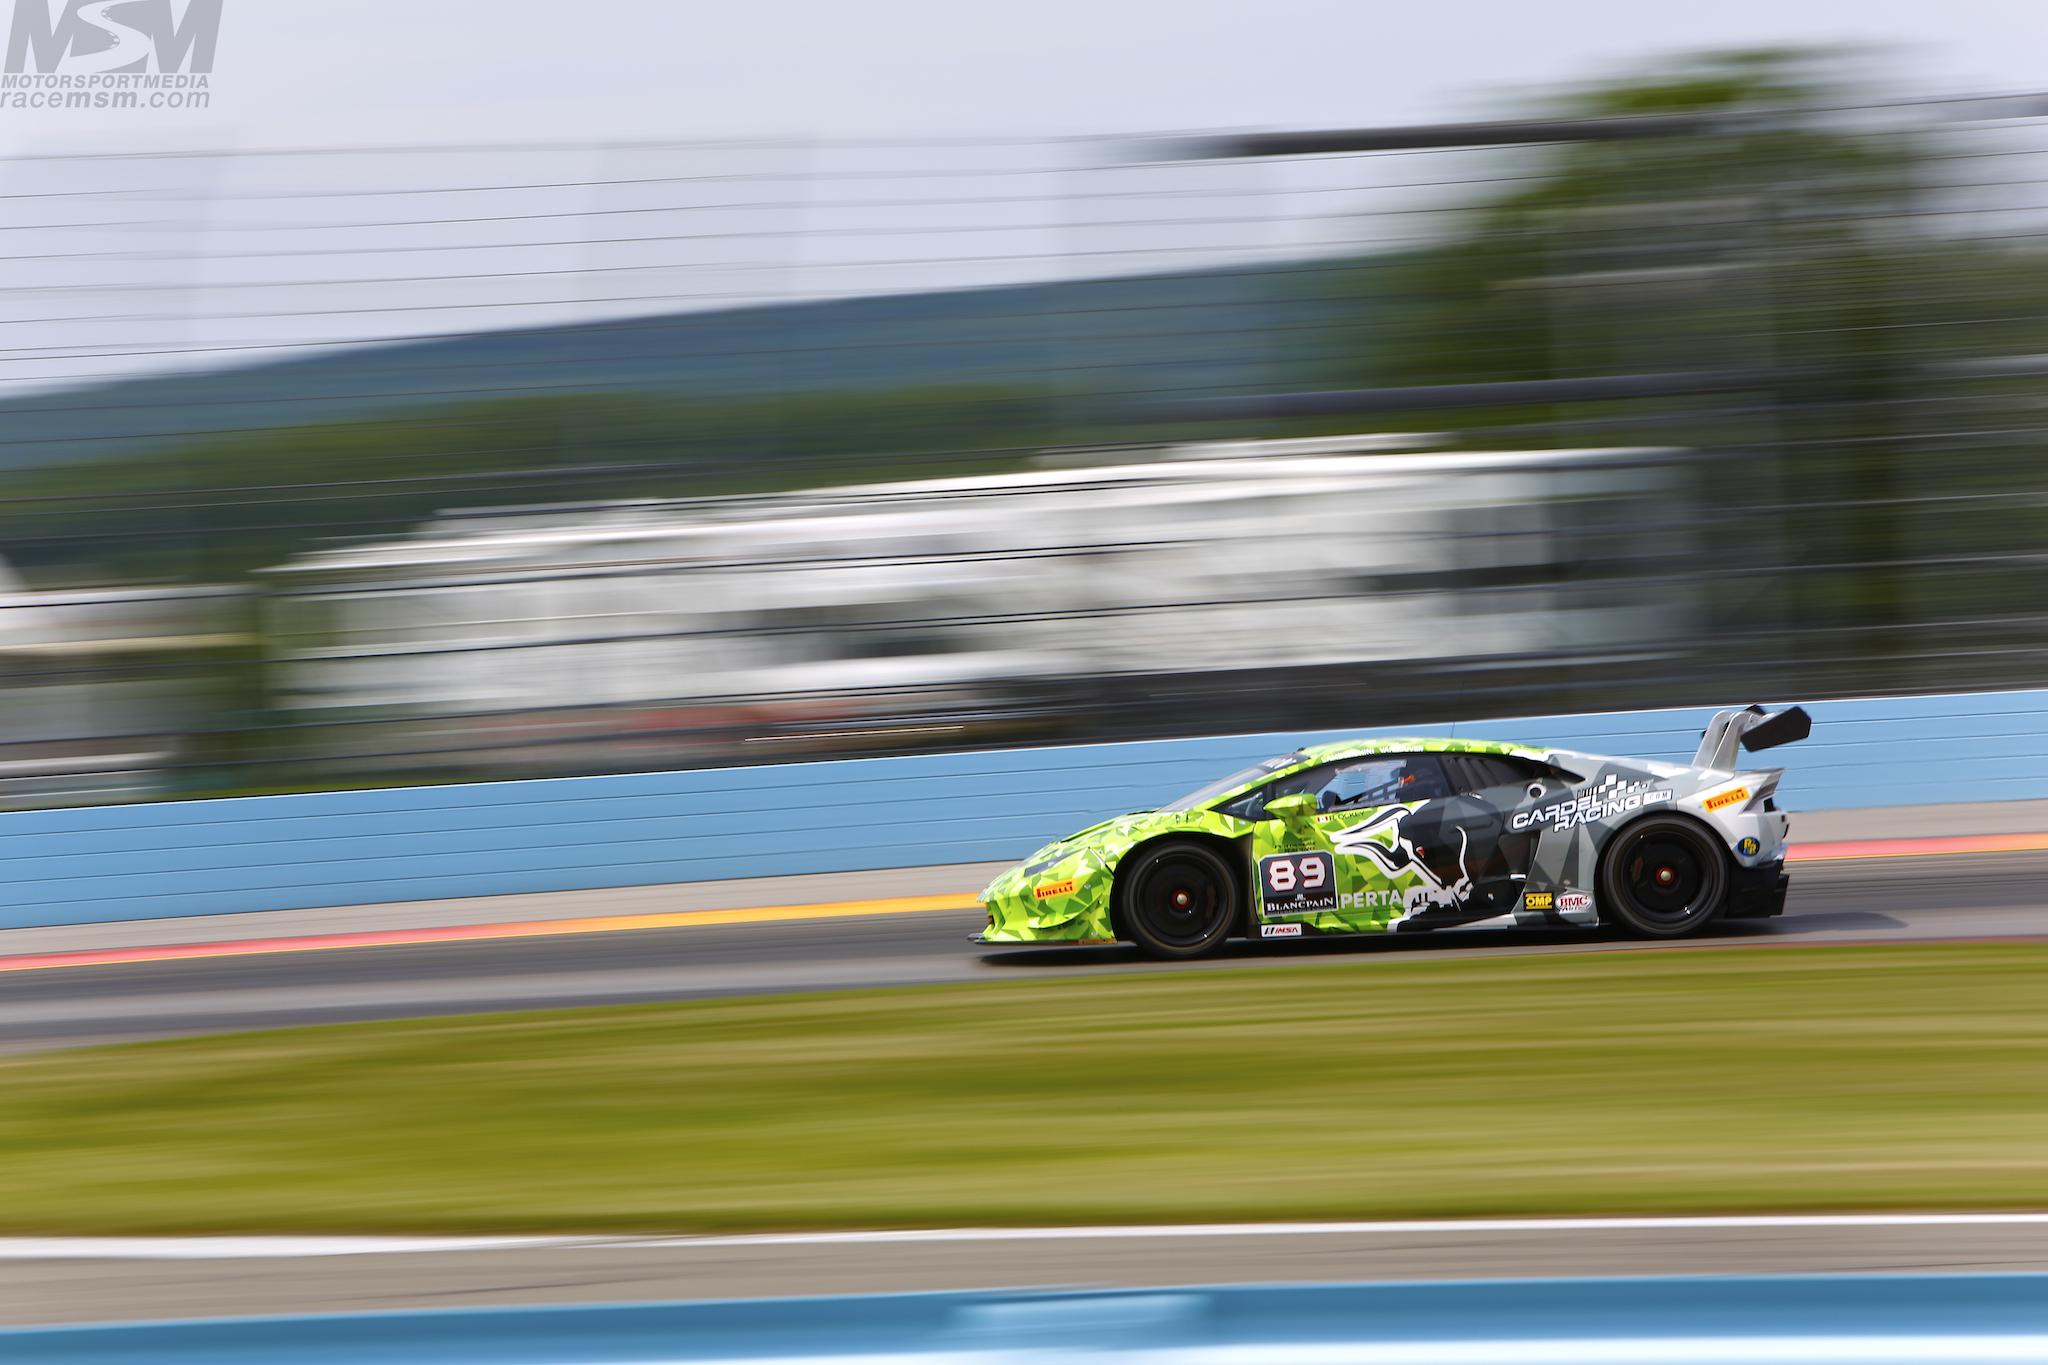 MotorSportMedia Watkins Glen Sunday 2015 (2).jpg